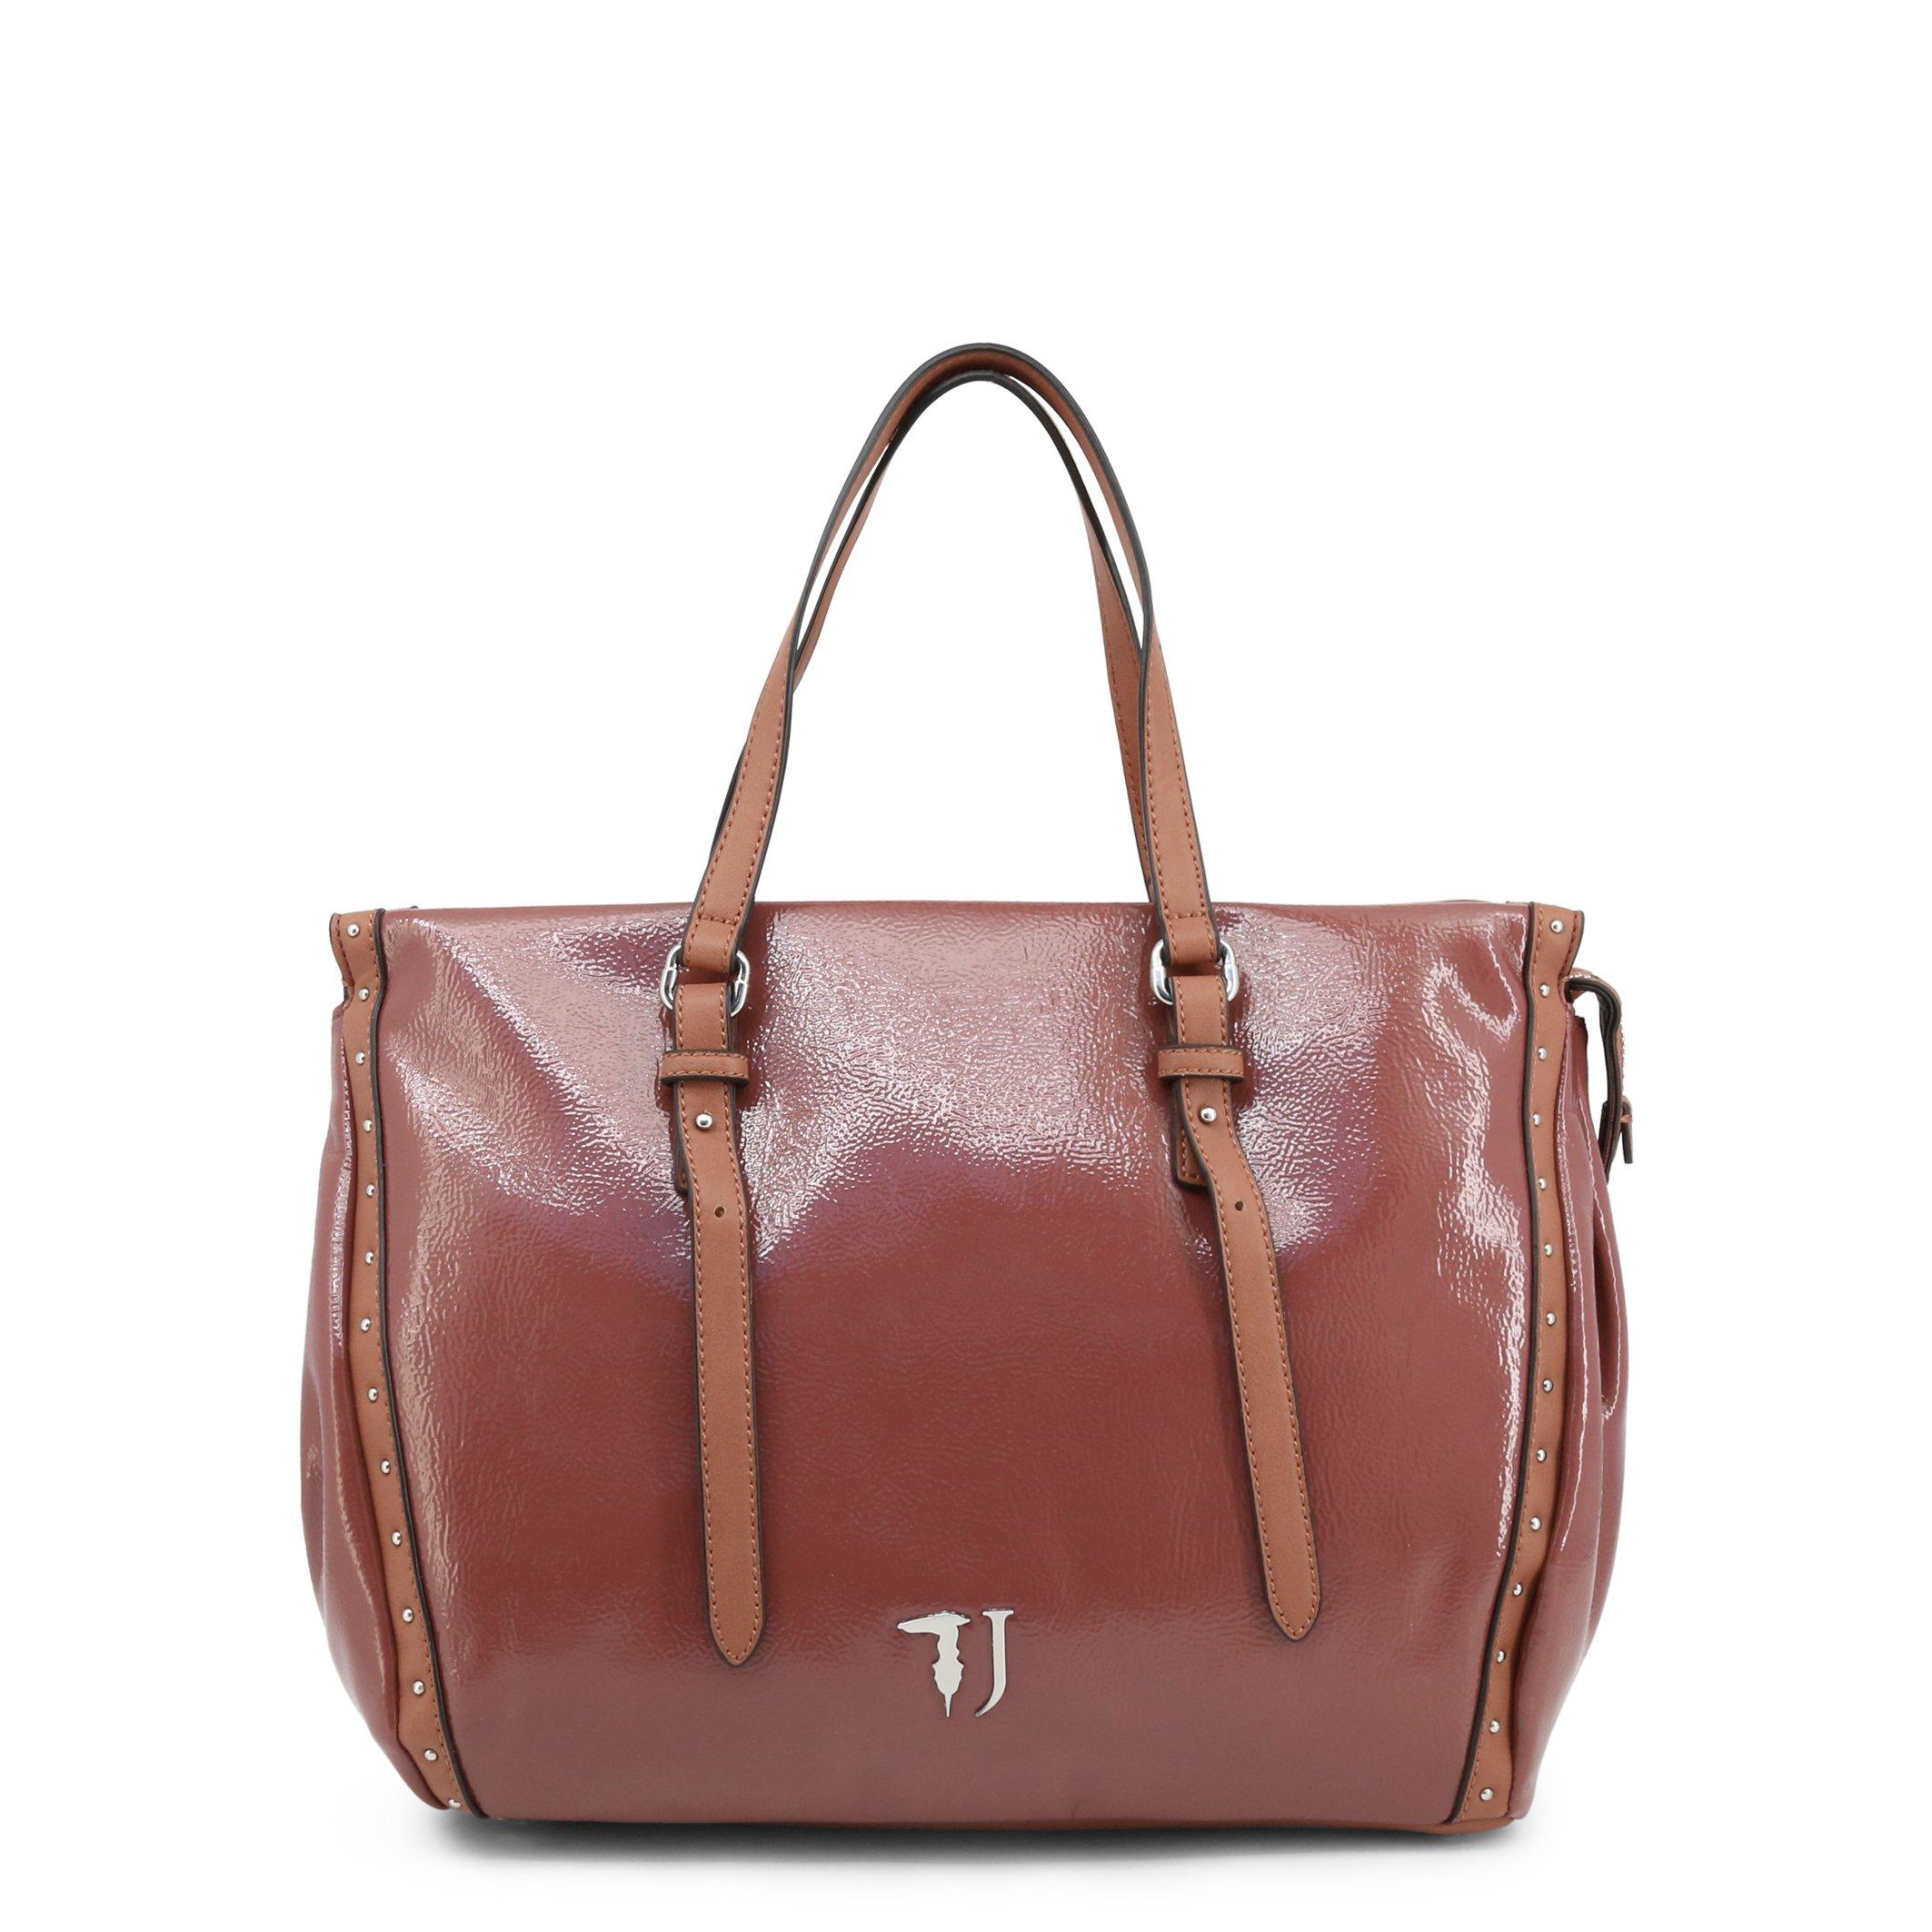 Trussardi Women's Shoulder Bag Various Colours PORTULACA_75B00537 - pink NOSIZE